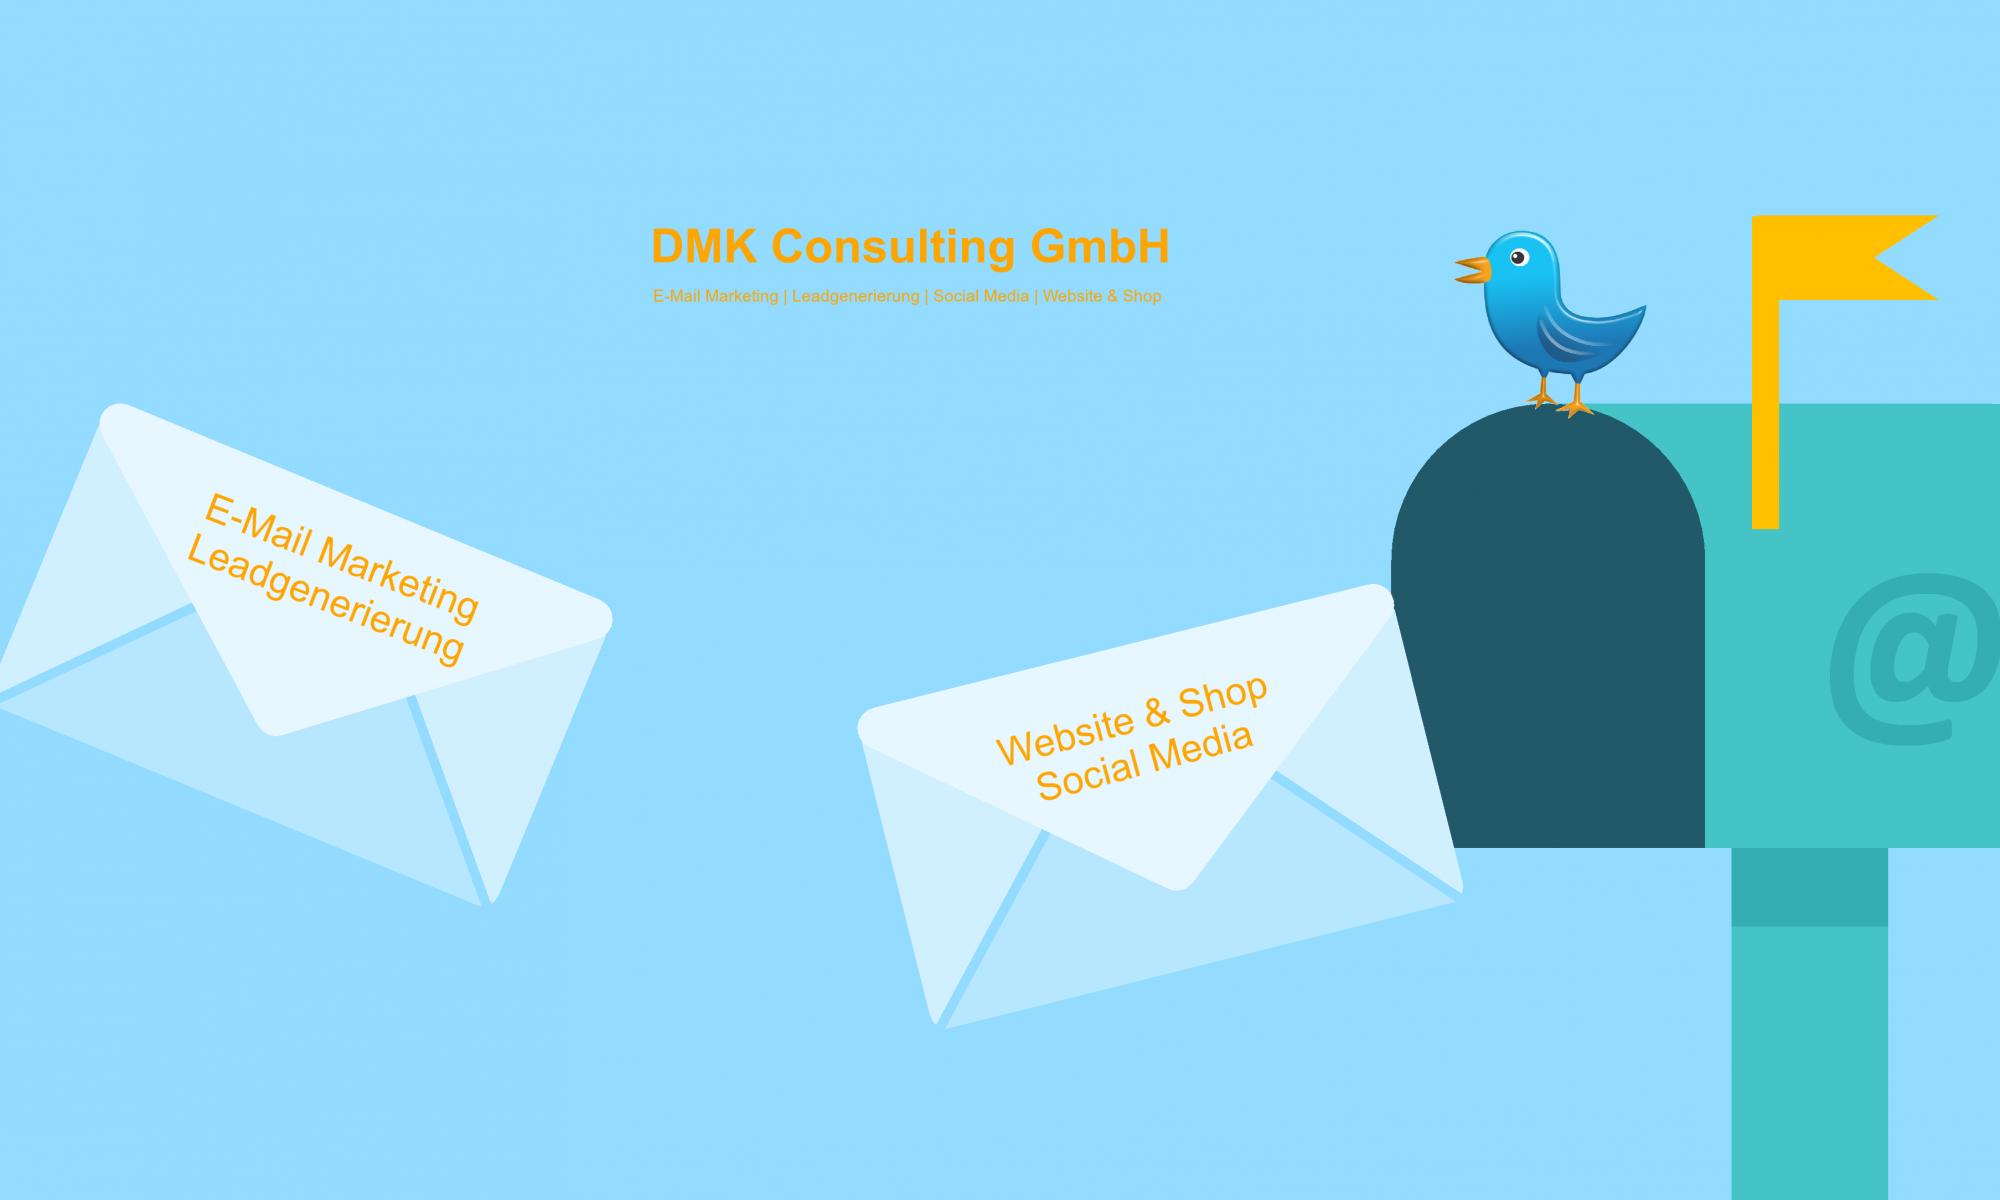 DMK Consulting GmbH